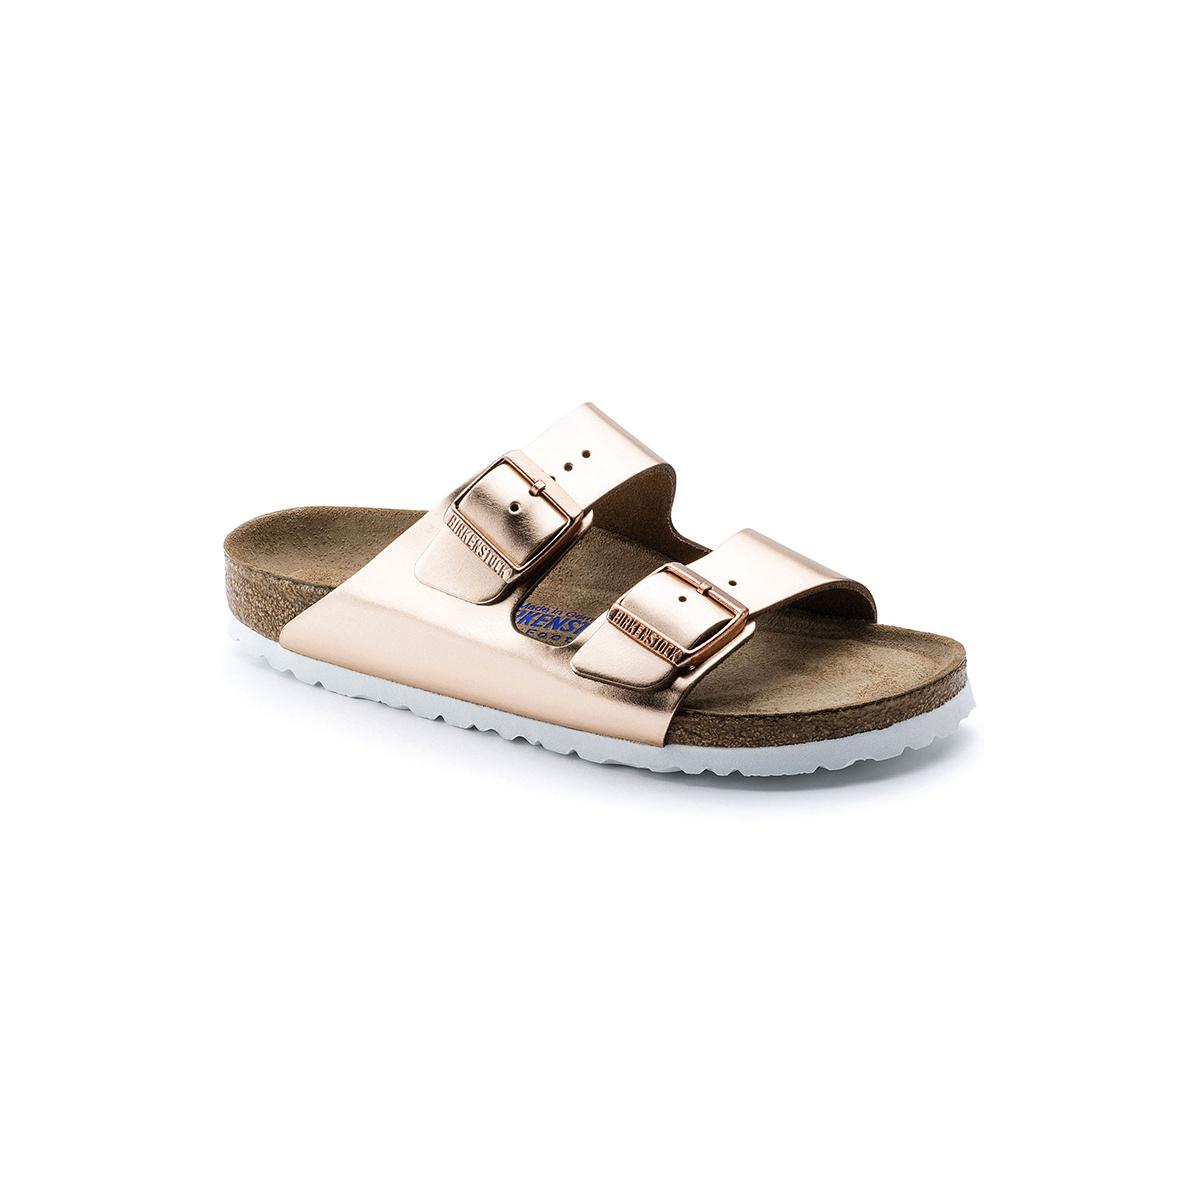 Birkenstock Arizona Soft Footbed Leather-Narrow